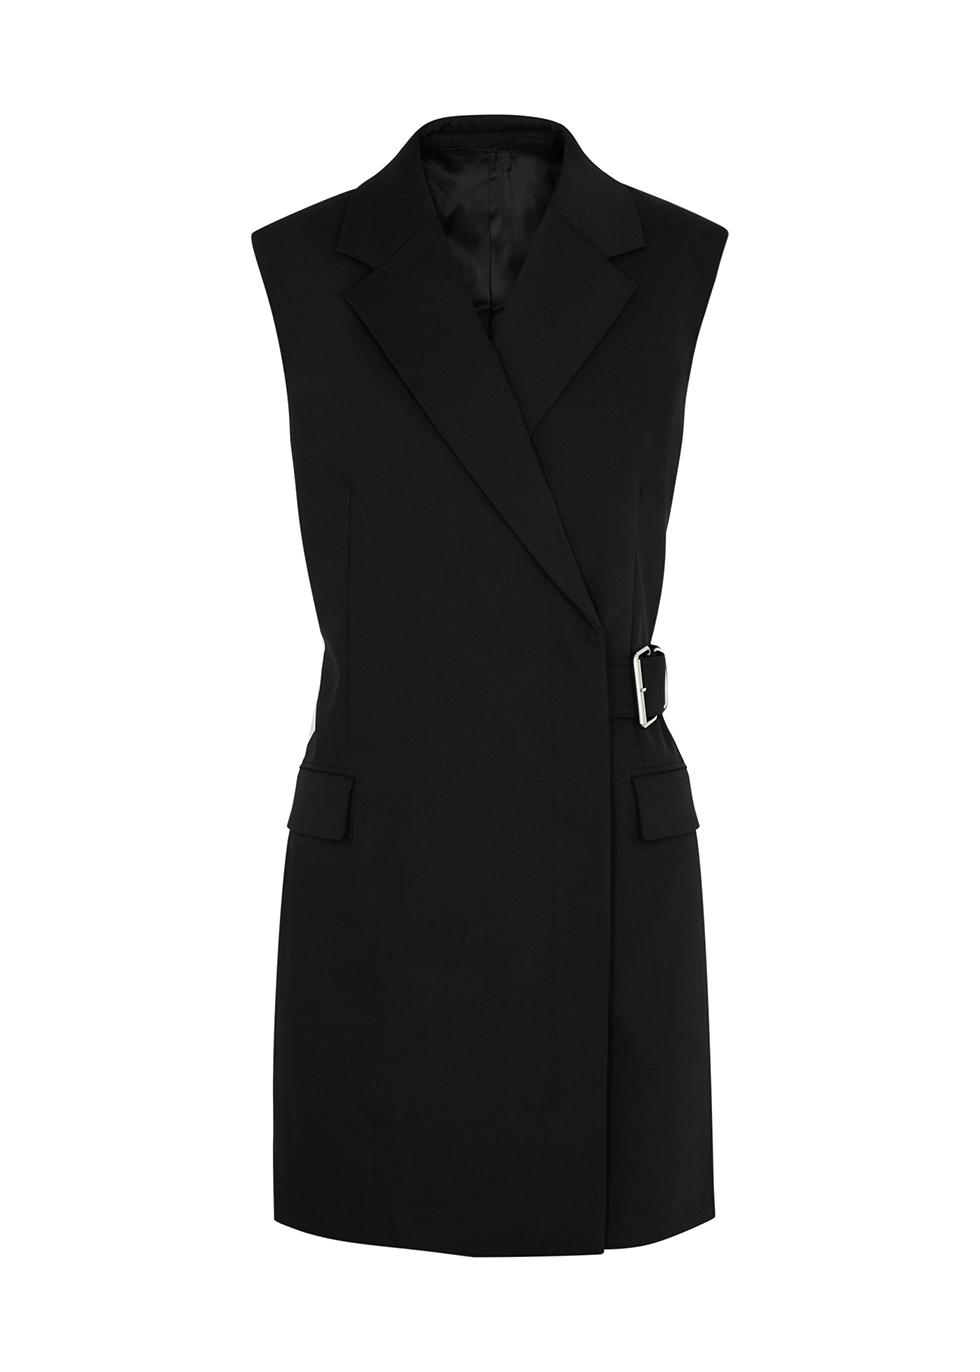 Black belted wool-blend blazer dress